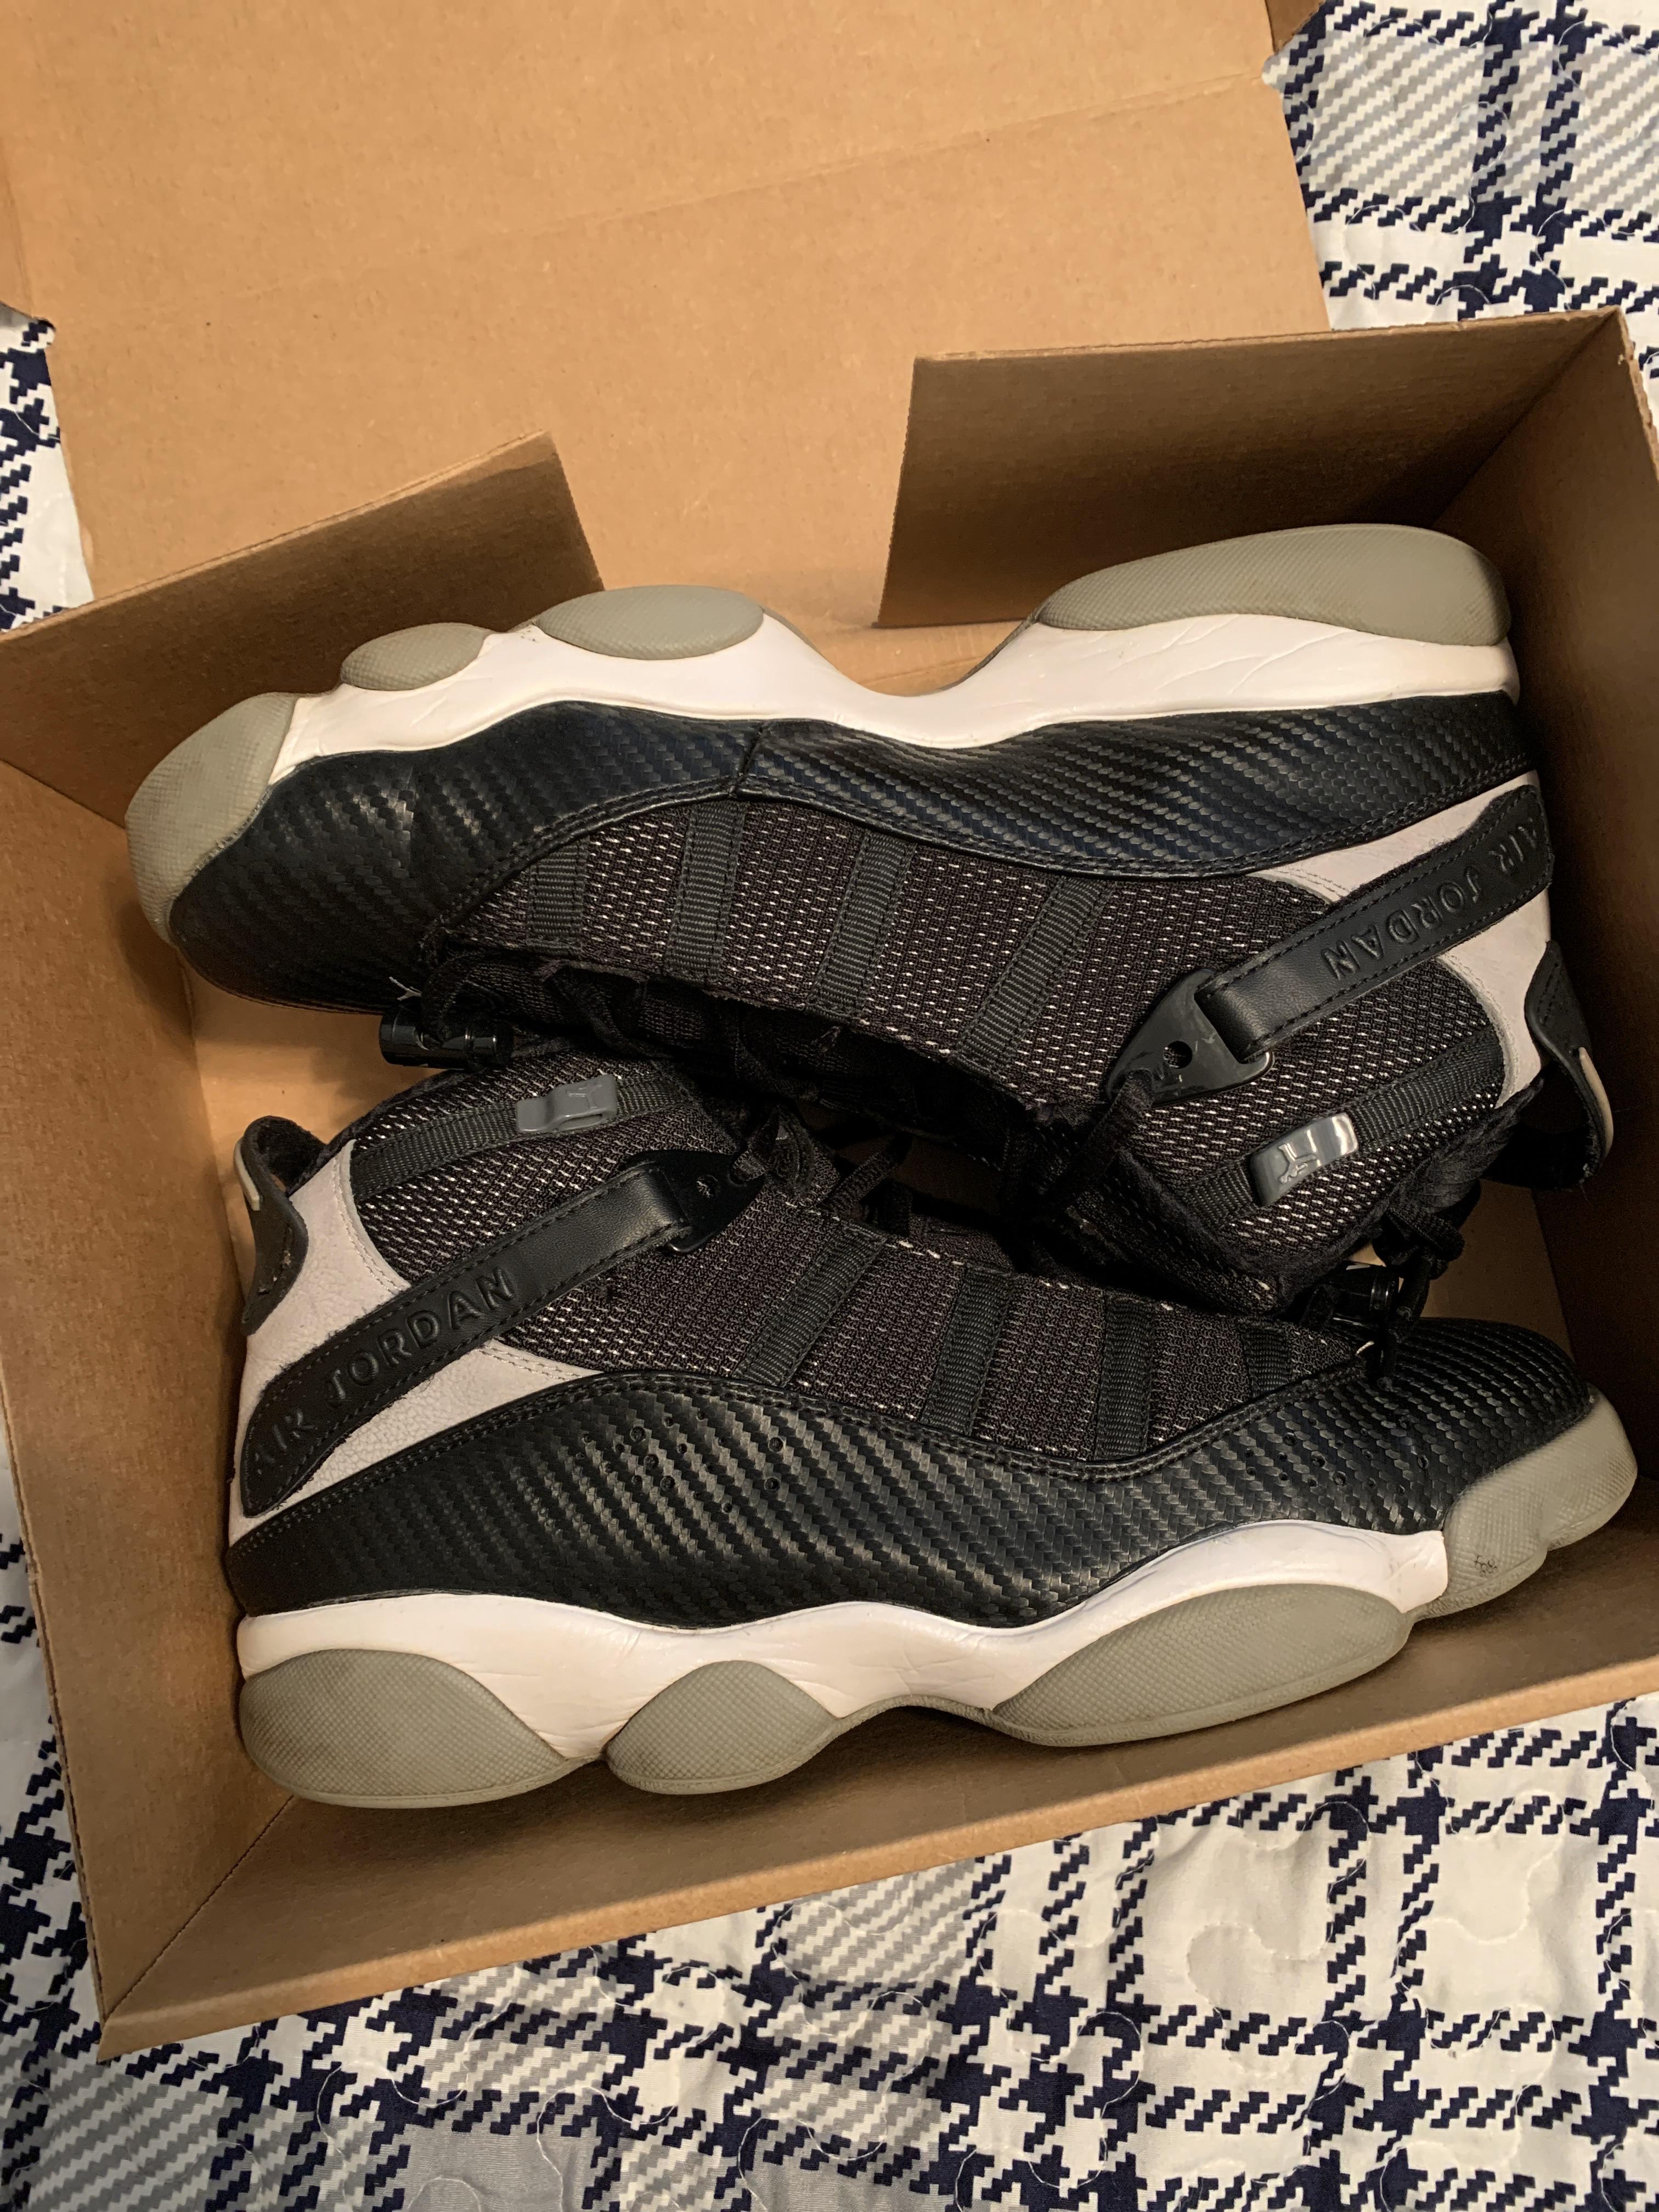 Air Jordan - $120 - Size 9